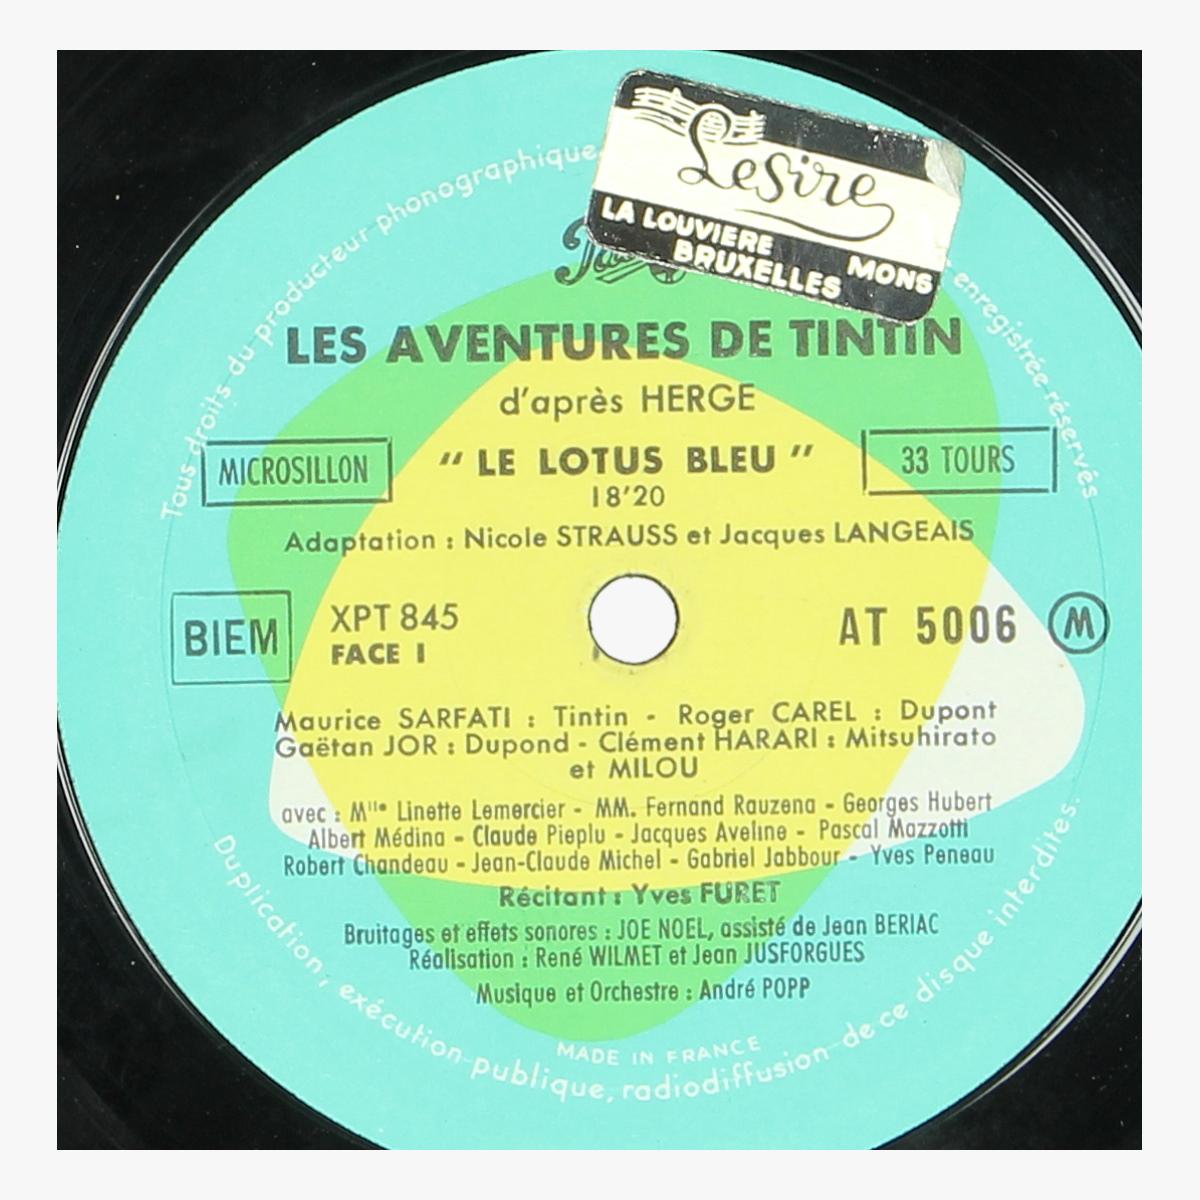 Afbeeldingen van kuifje lp '' le lotus bleu'' tintin hergé 1962 made in france